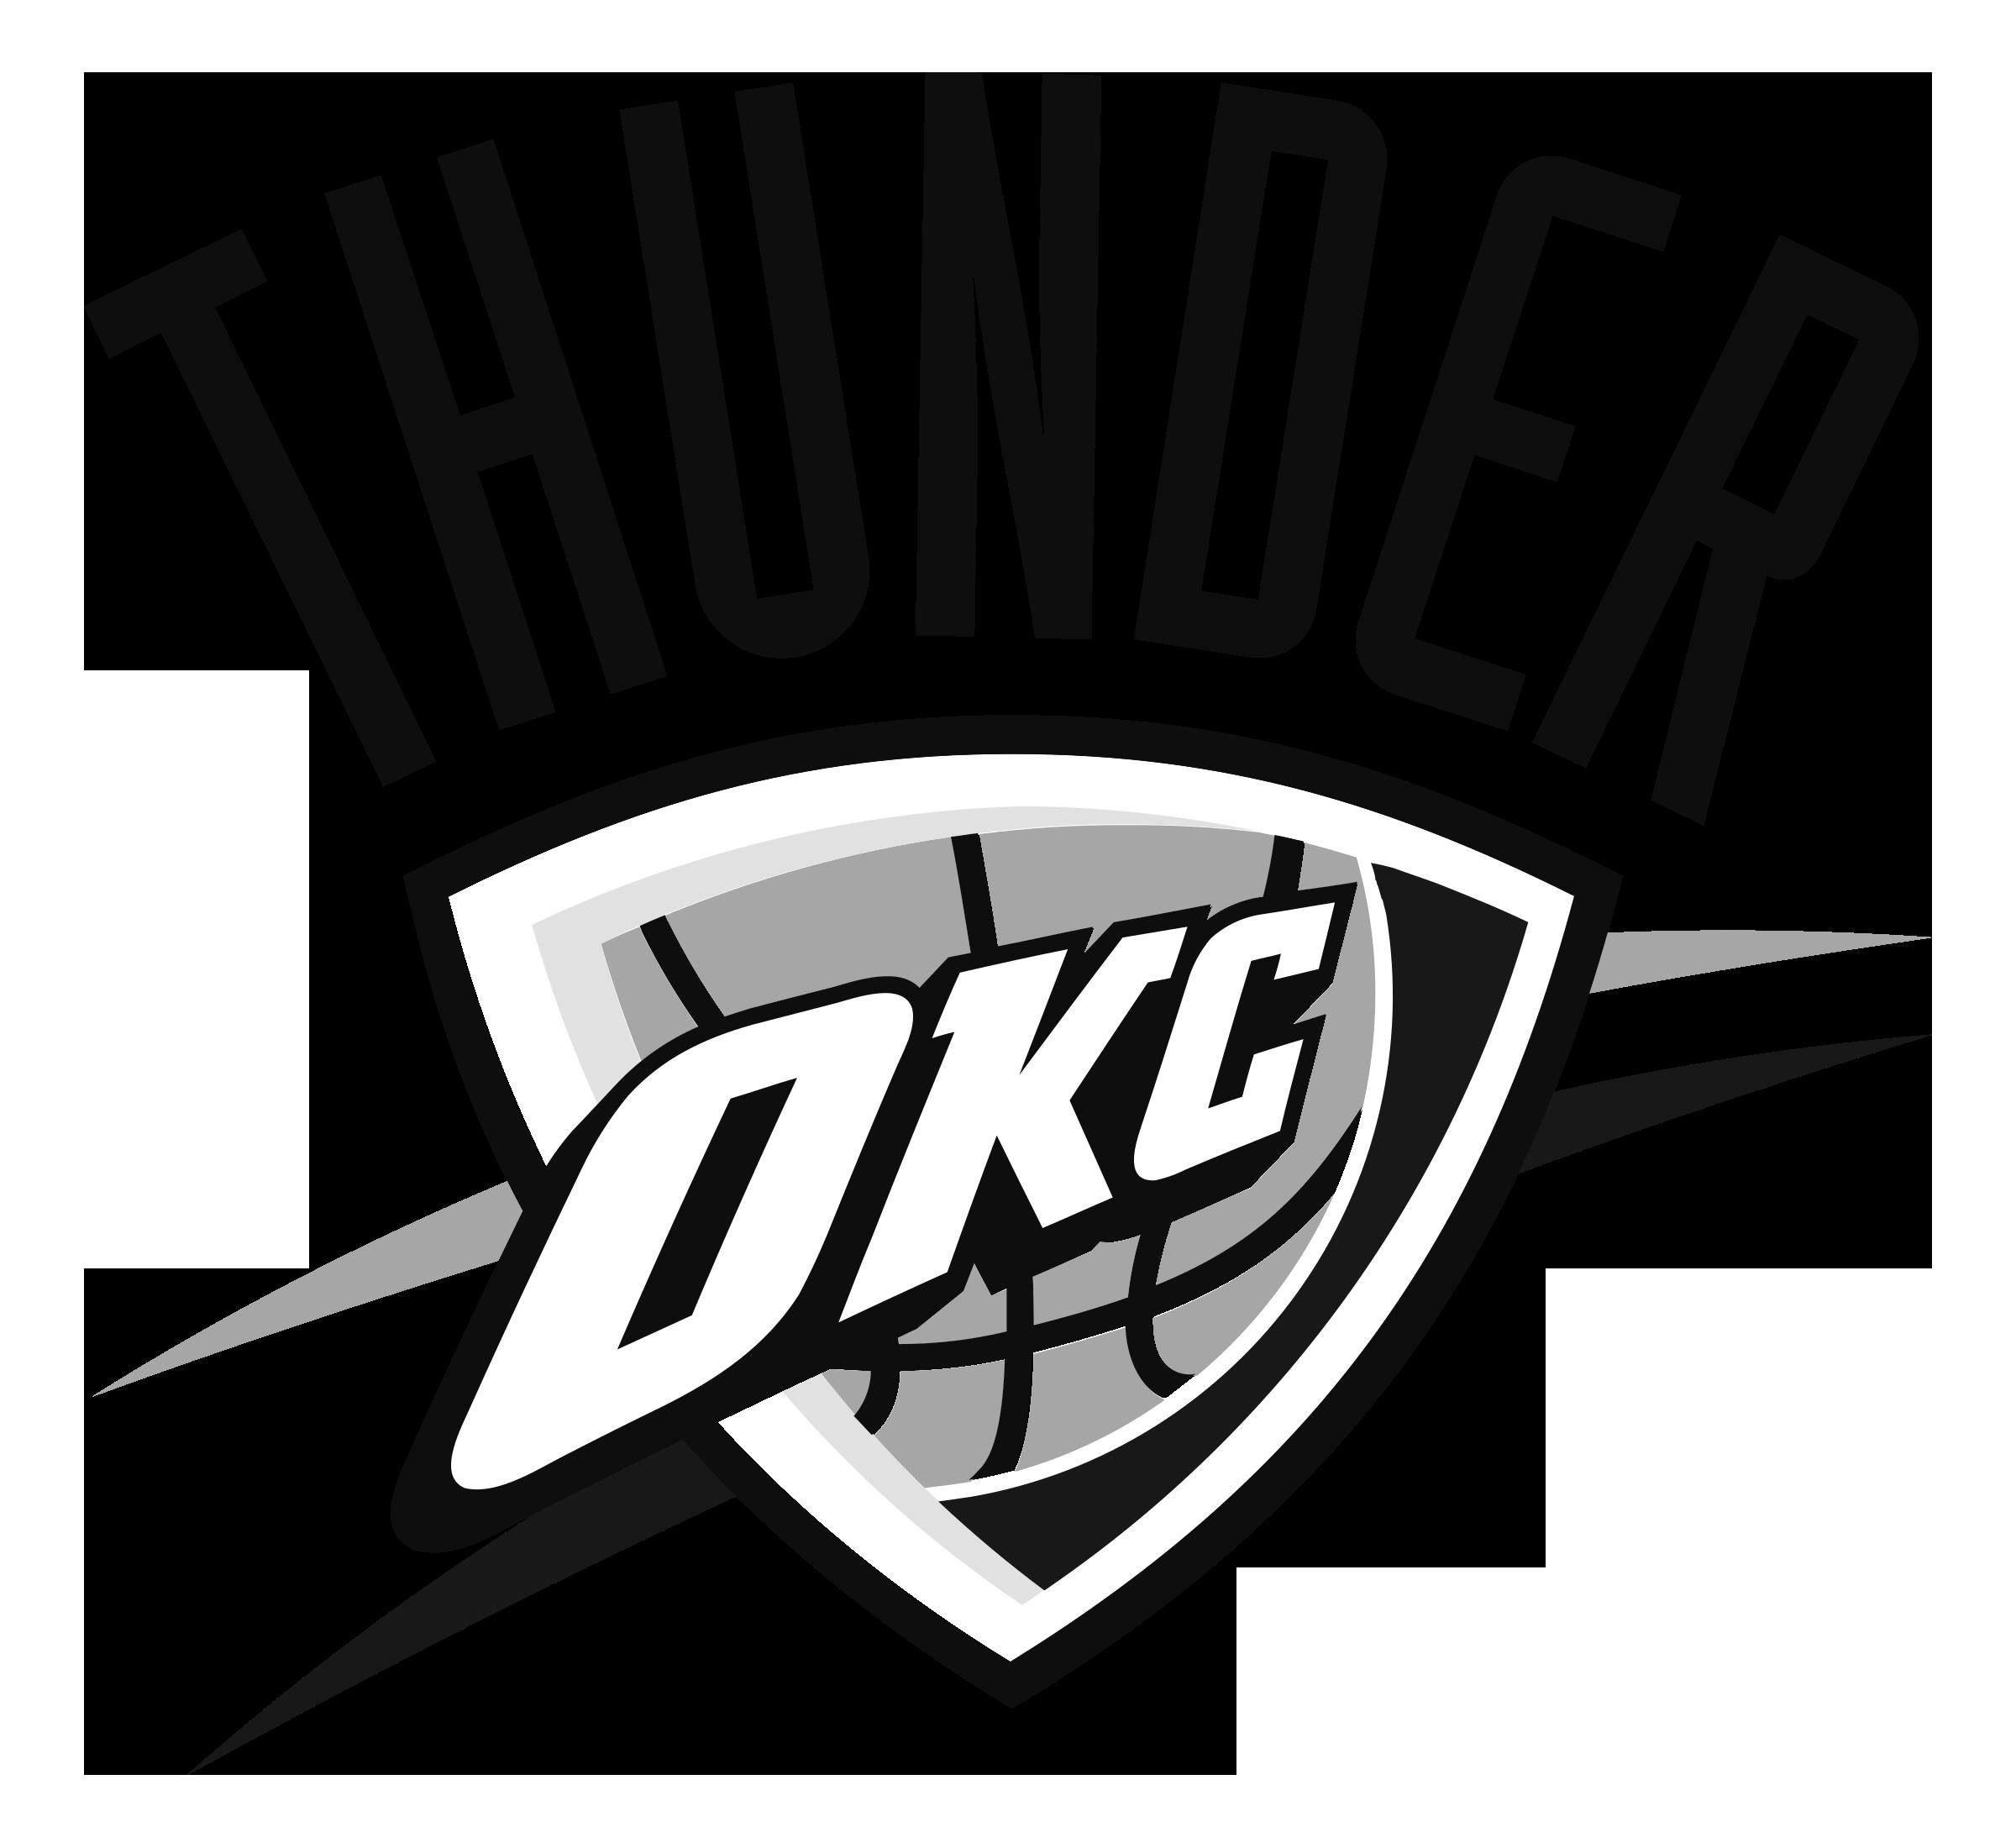 Oklahoma City Thunder Logo Black And White